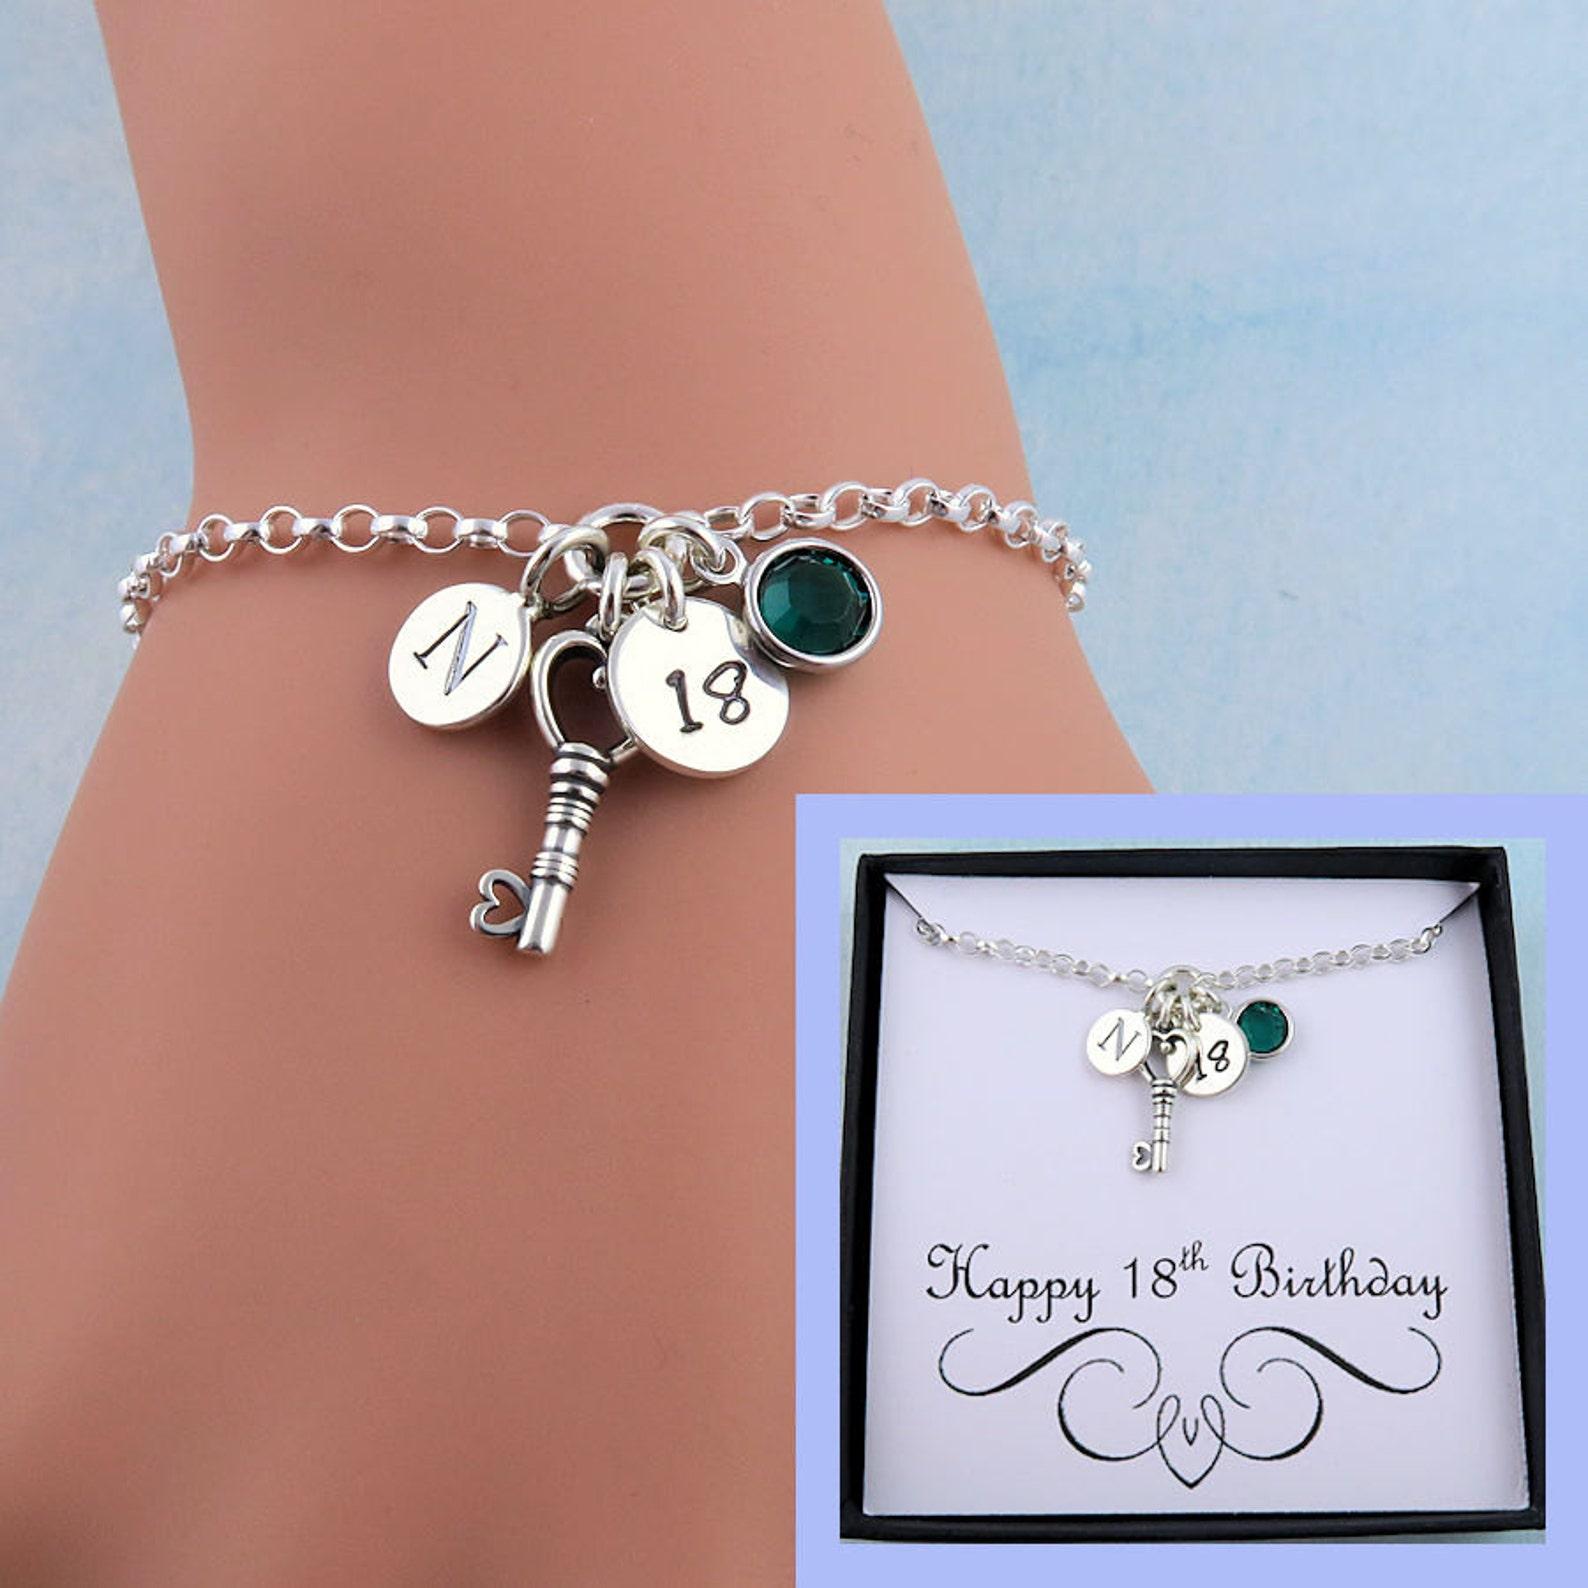 18th bracelet